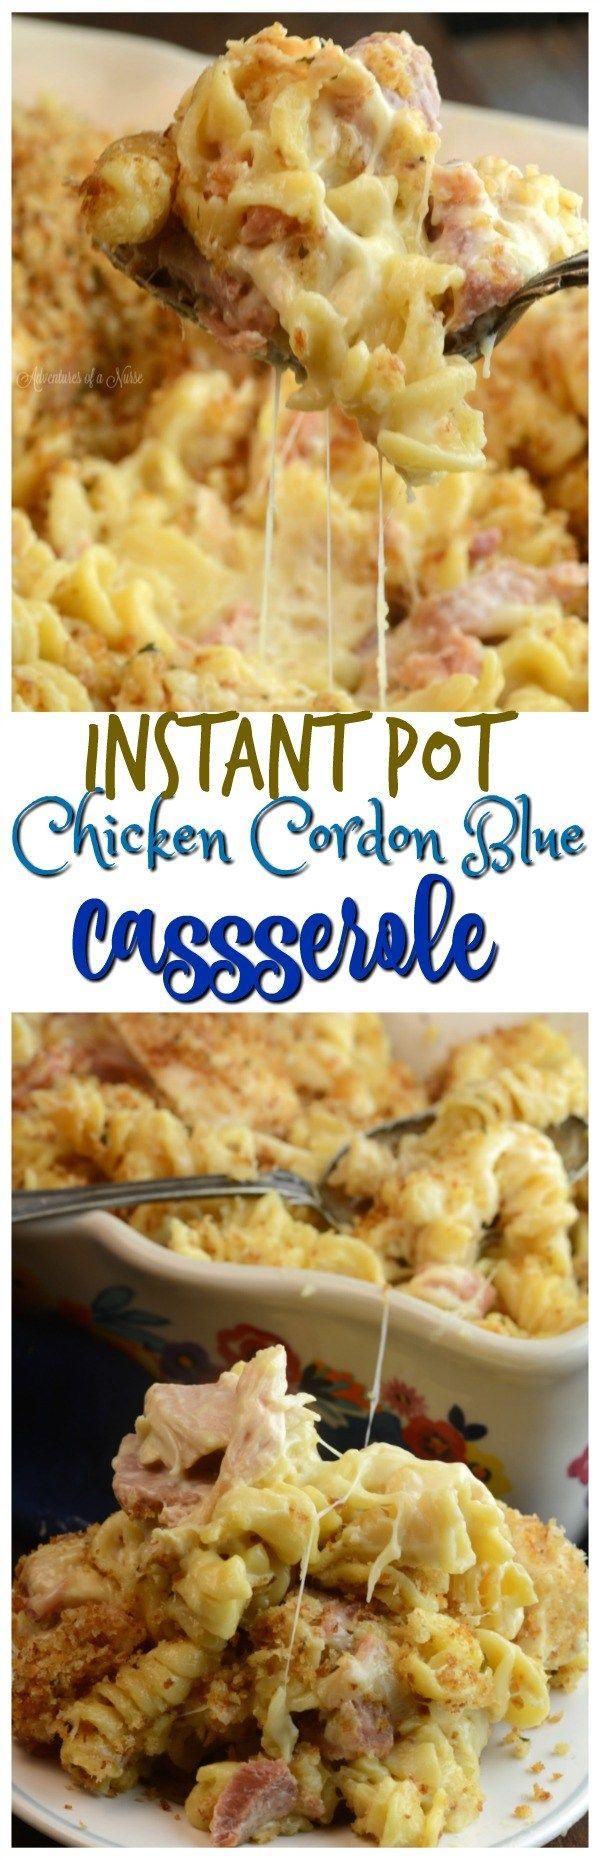 Crispy Hot Chicken Salad Casserole